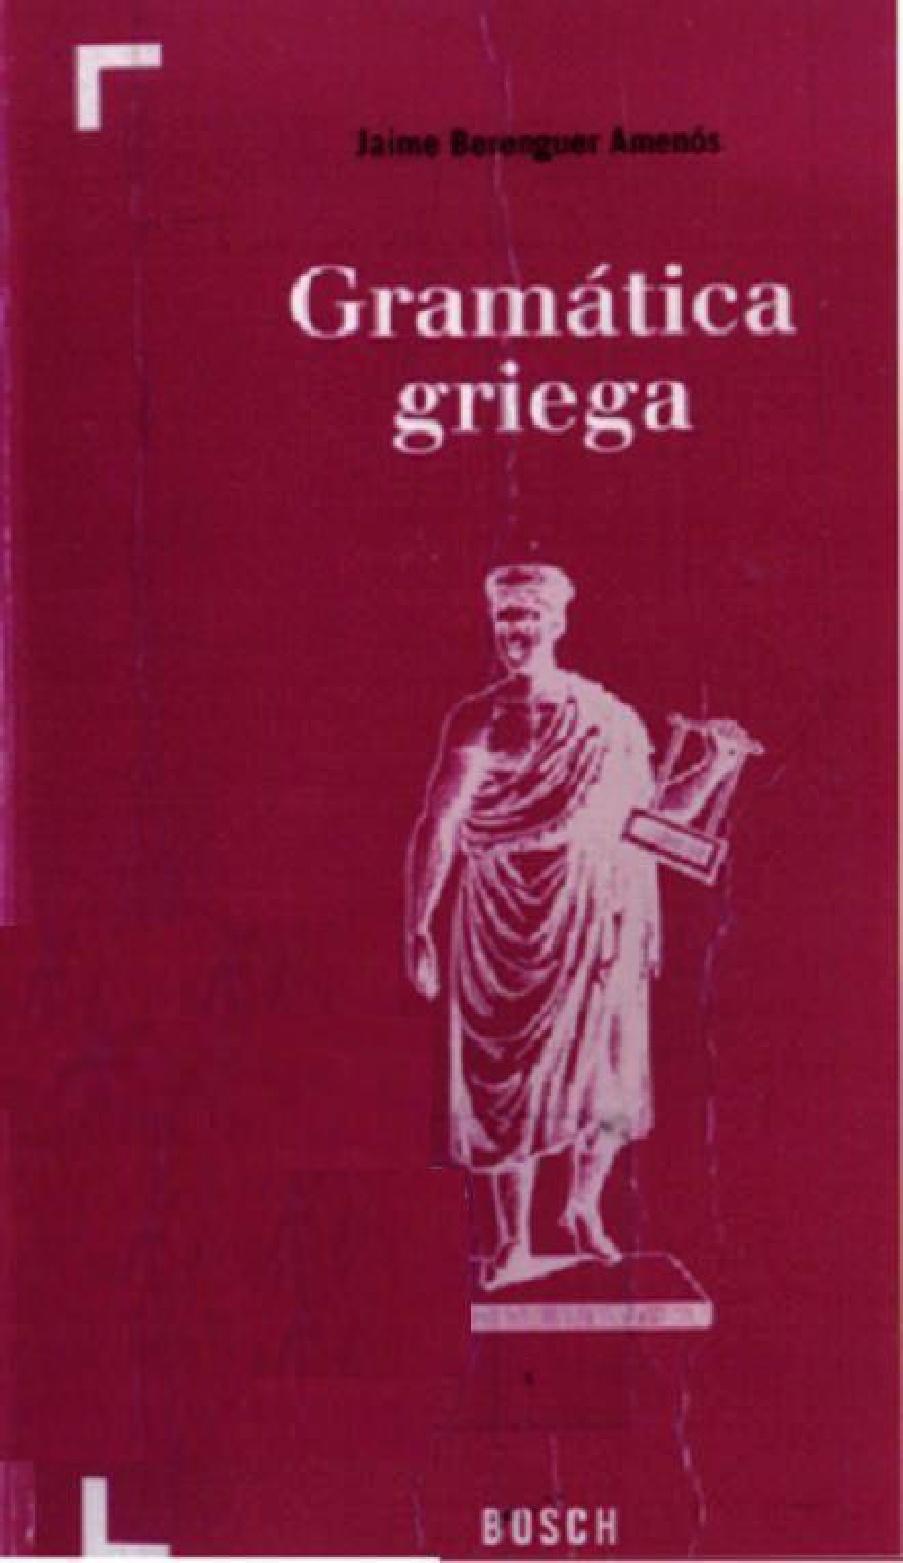 Griego antiguo: gramática